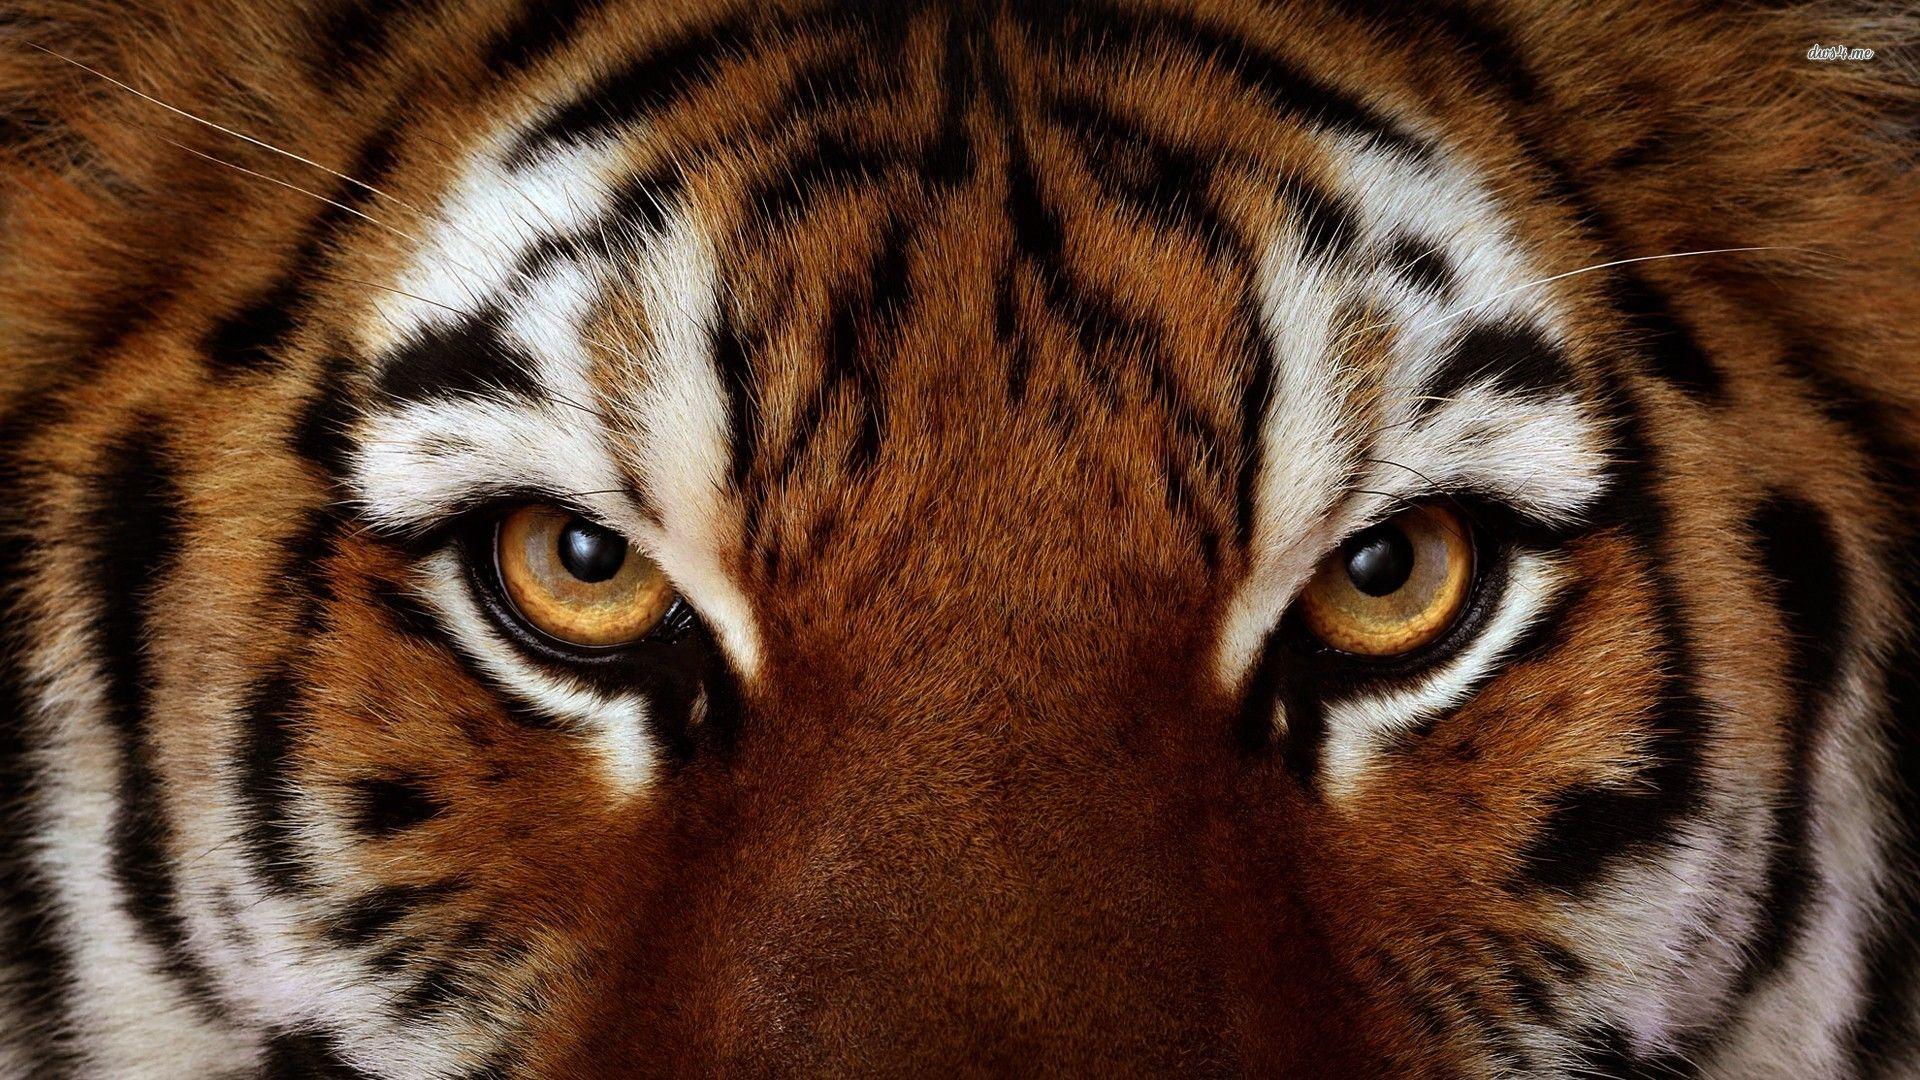 90 Angry Tiger Eyes Wallpapers On Wallpapersafari